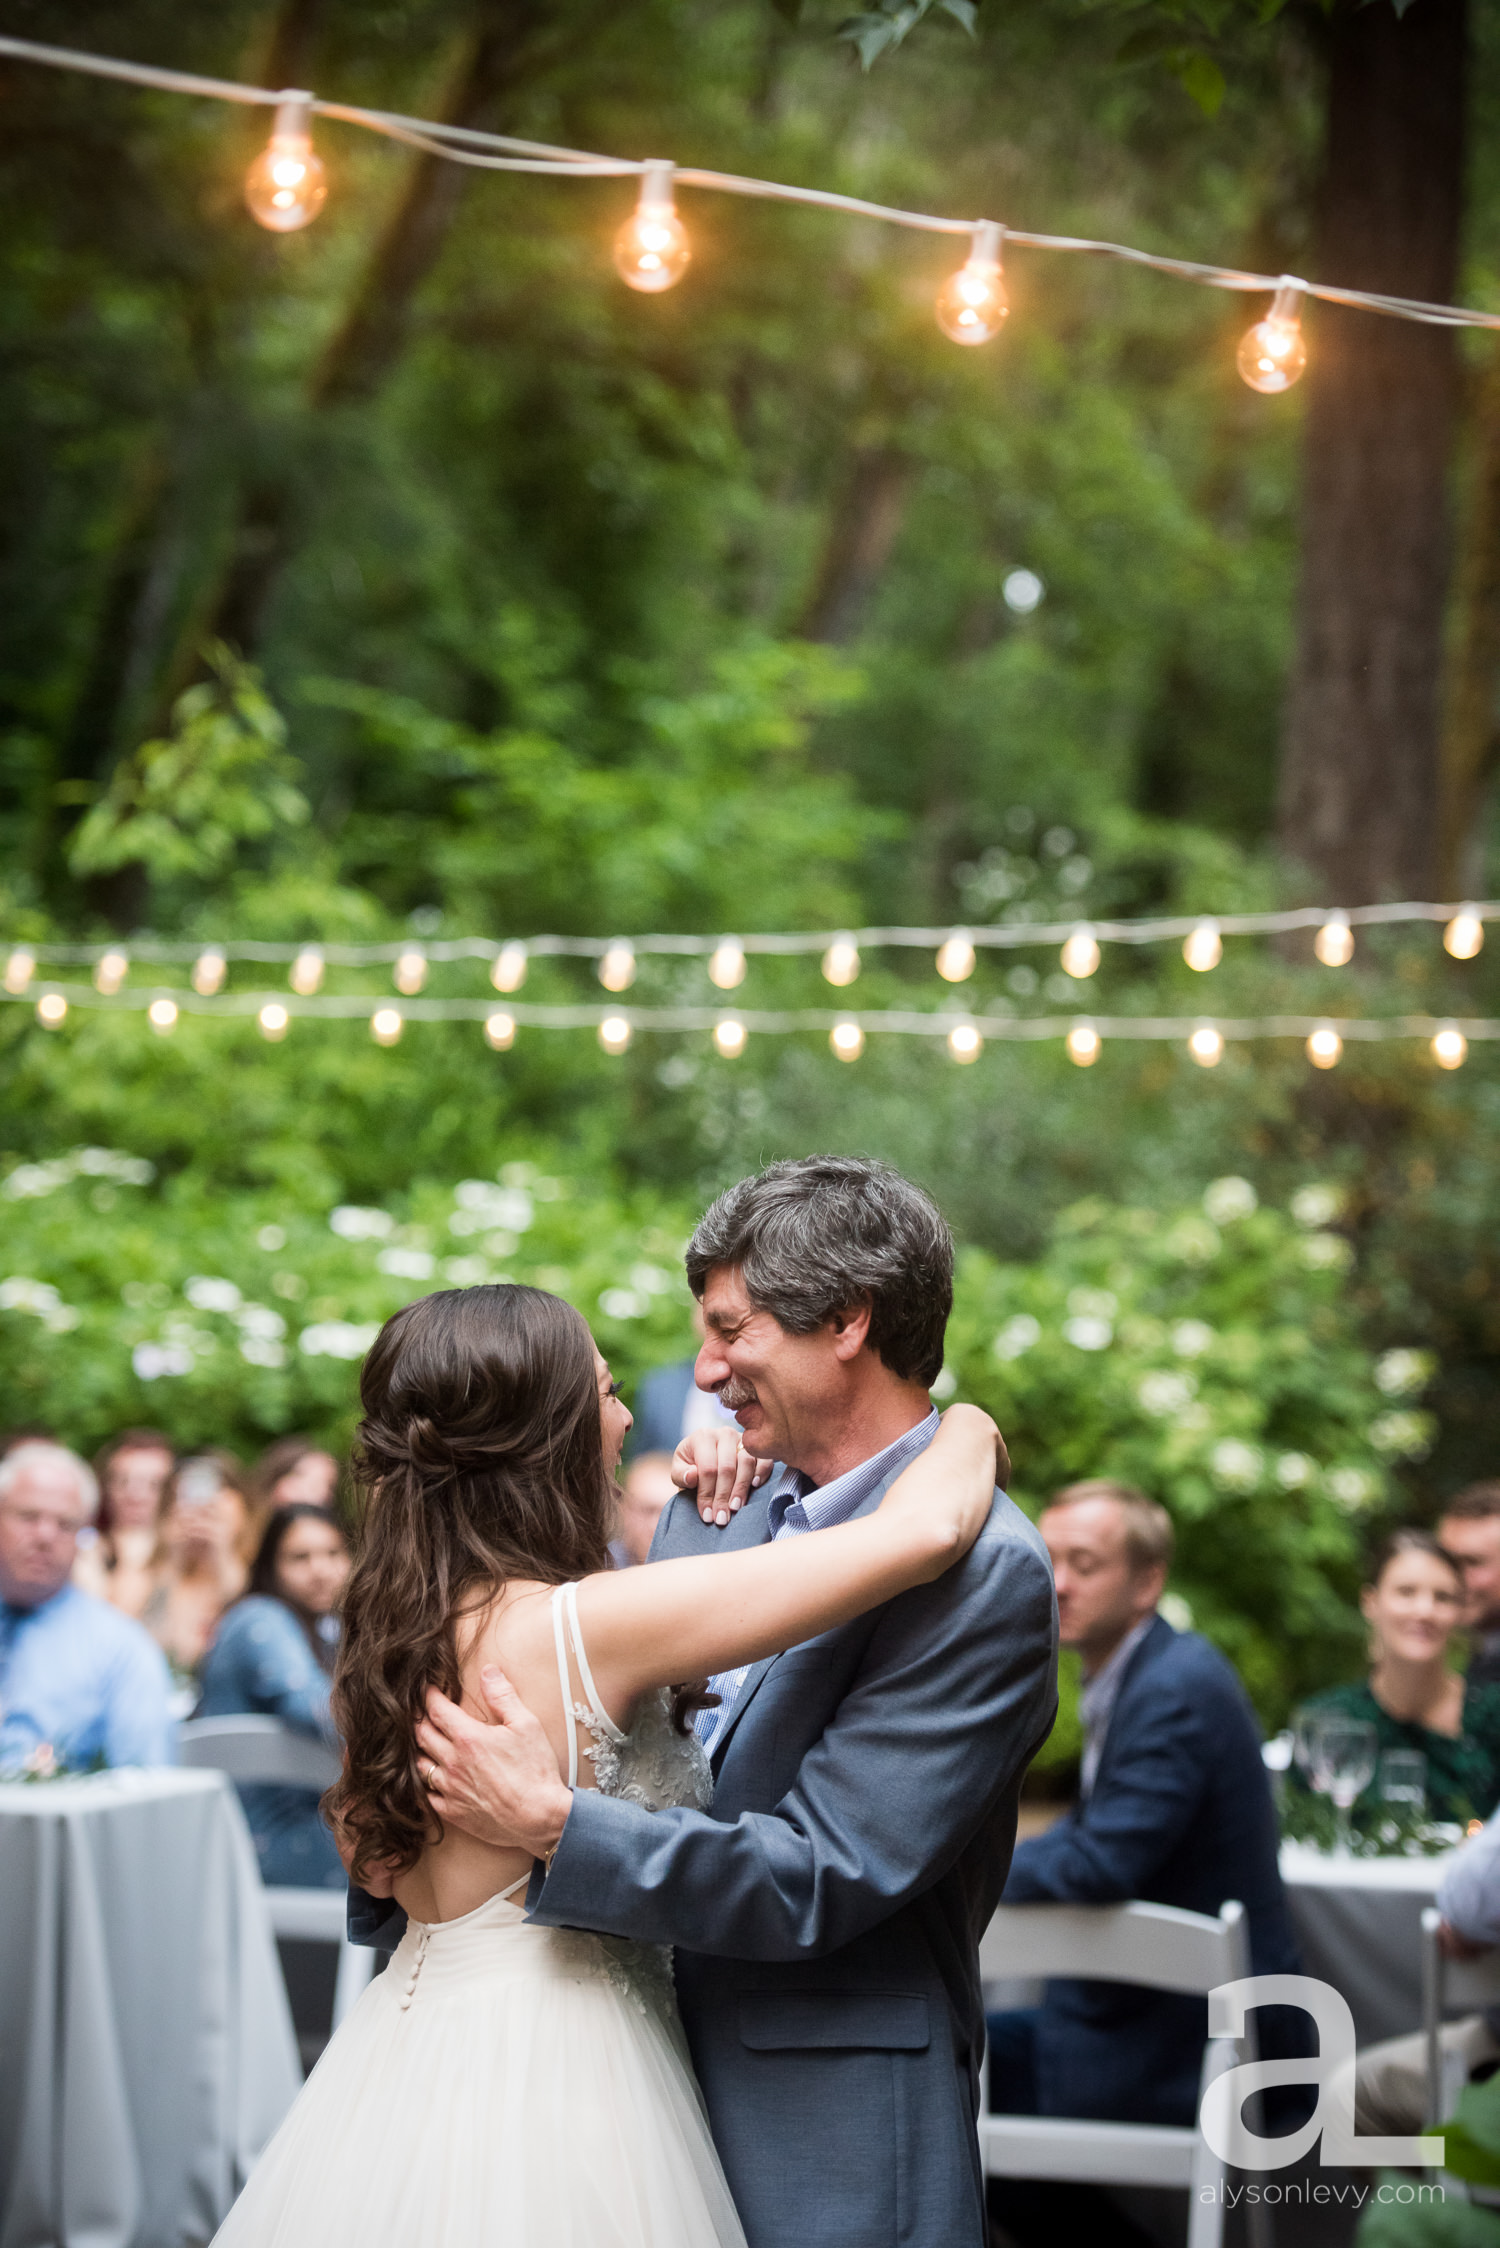 Leach-Botanical-Garden-Portland-Wedding-Photography-028.jpg